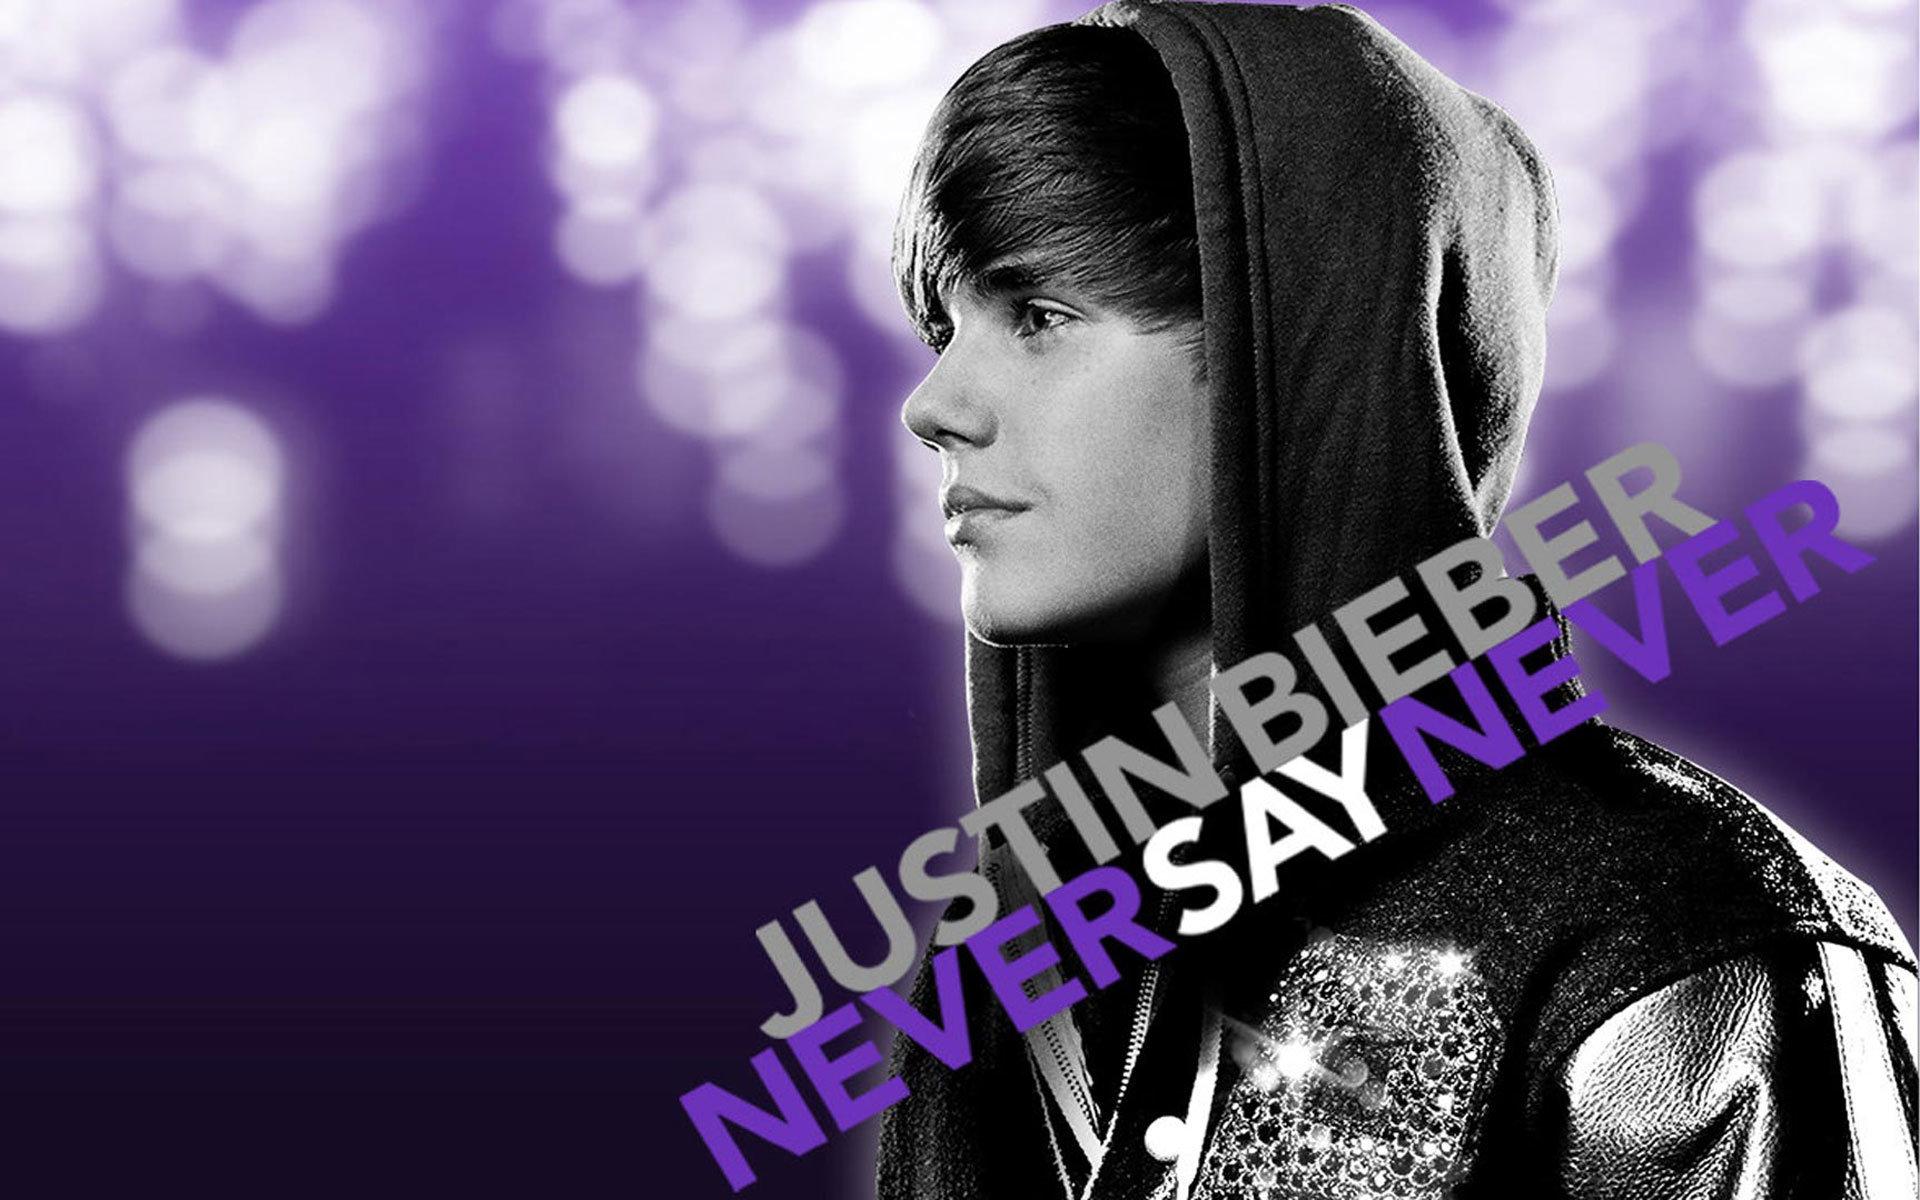 Free Download Justin Bieber Wallpaper Id 162410 Hd 1920x1200 For Pc